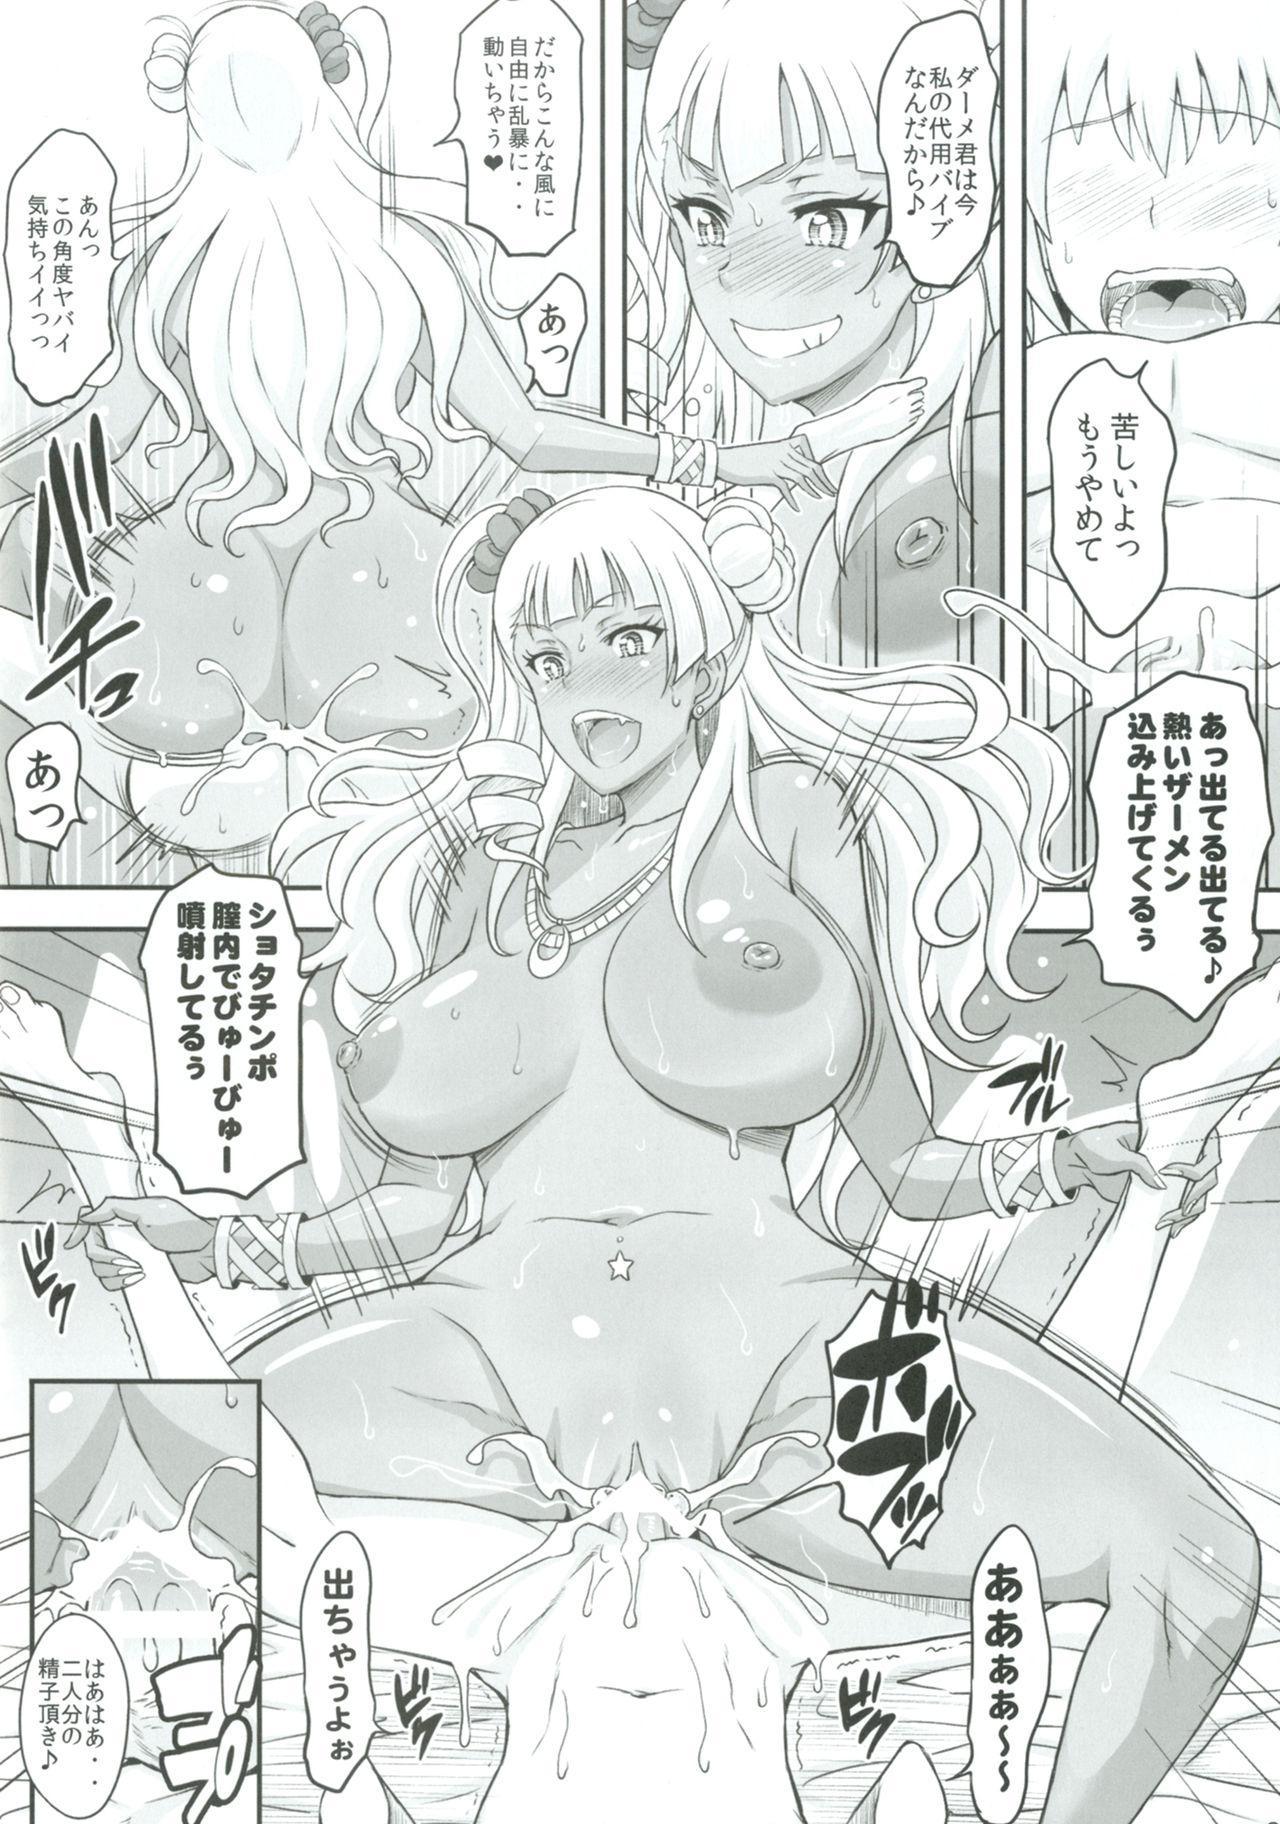 Omakase Fudeoroshi Galko-chan 2 19